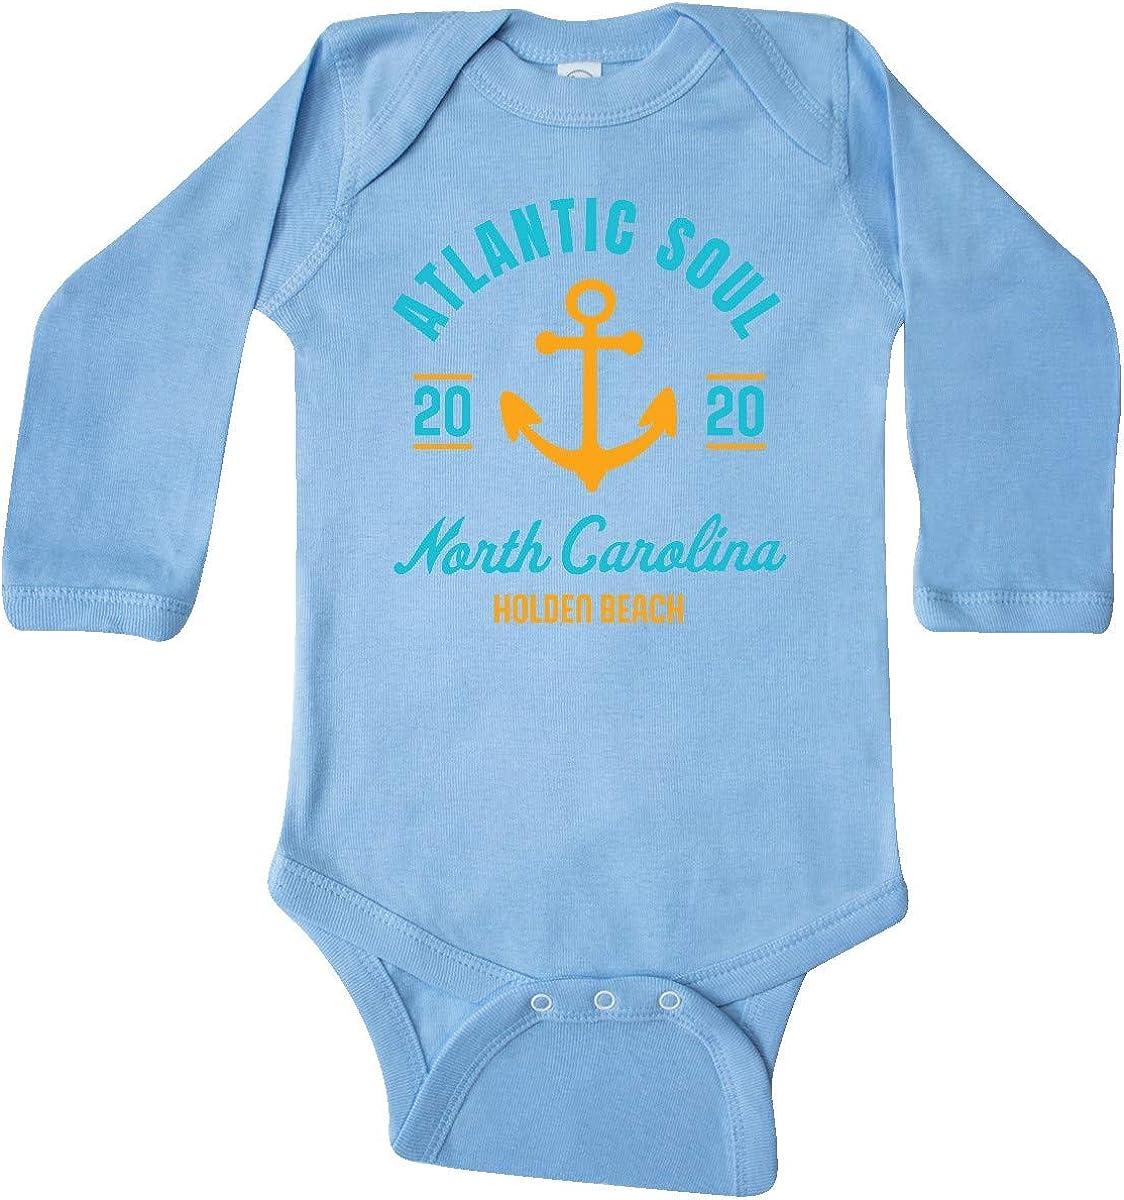 inktastic Atlantic Soul North Carolina Holden Beach 2020 Long Sleeve Creeper